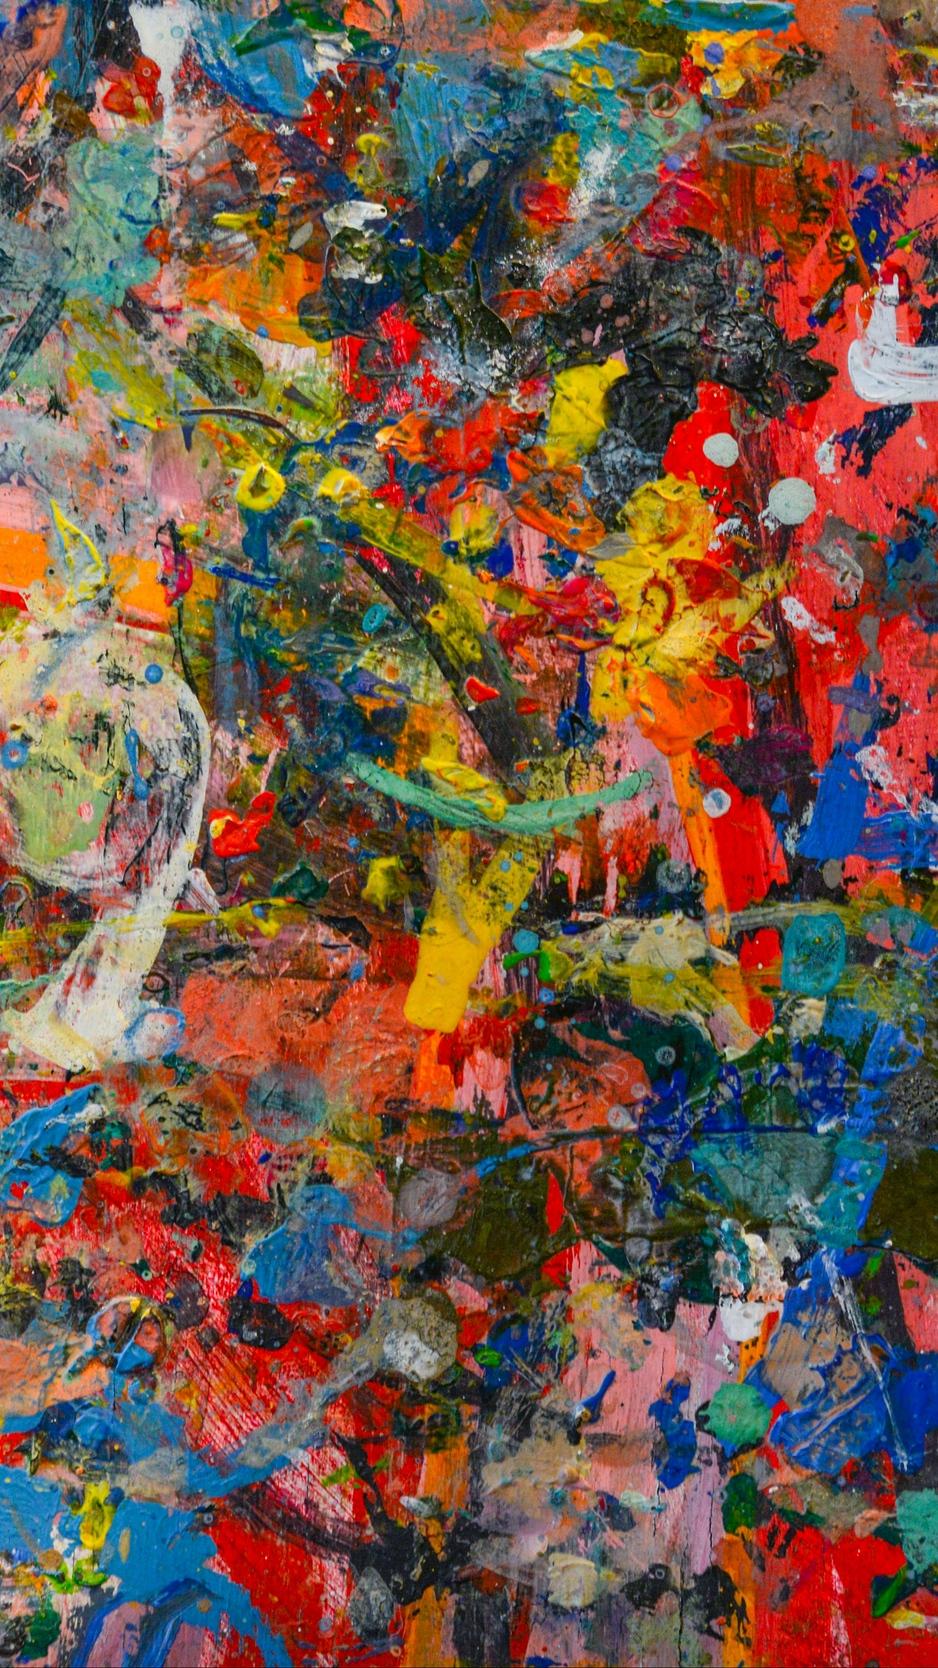 Wallpaper Art, Surface, Grunge, Paint - Samsung S8 Plus Wallpaper Color - HD Wallpaper